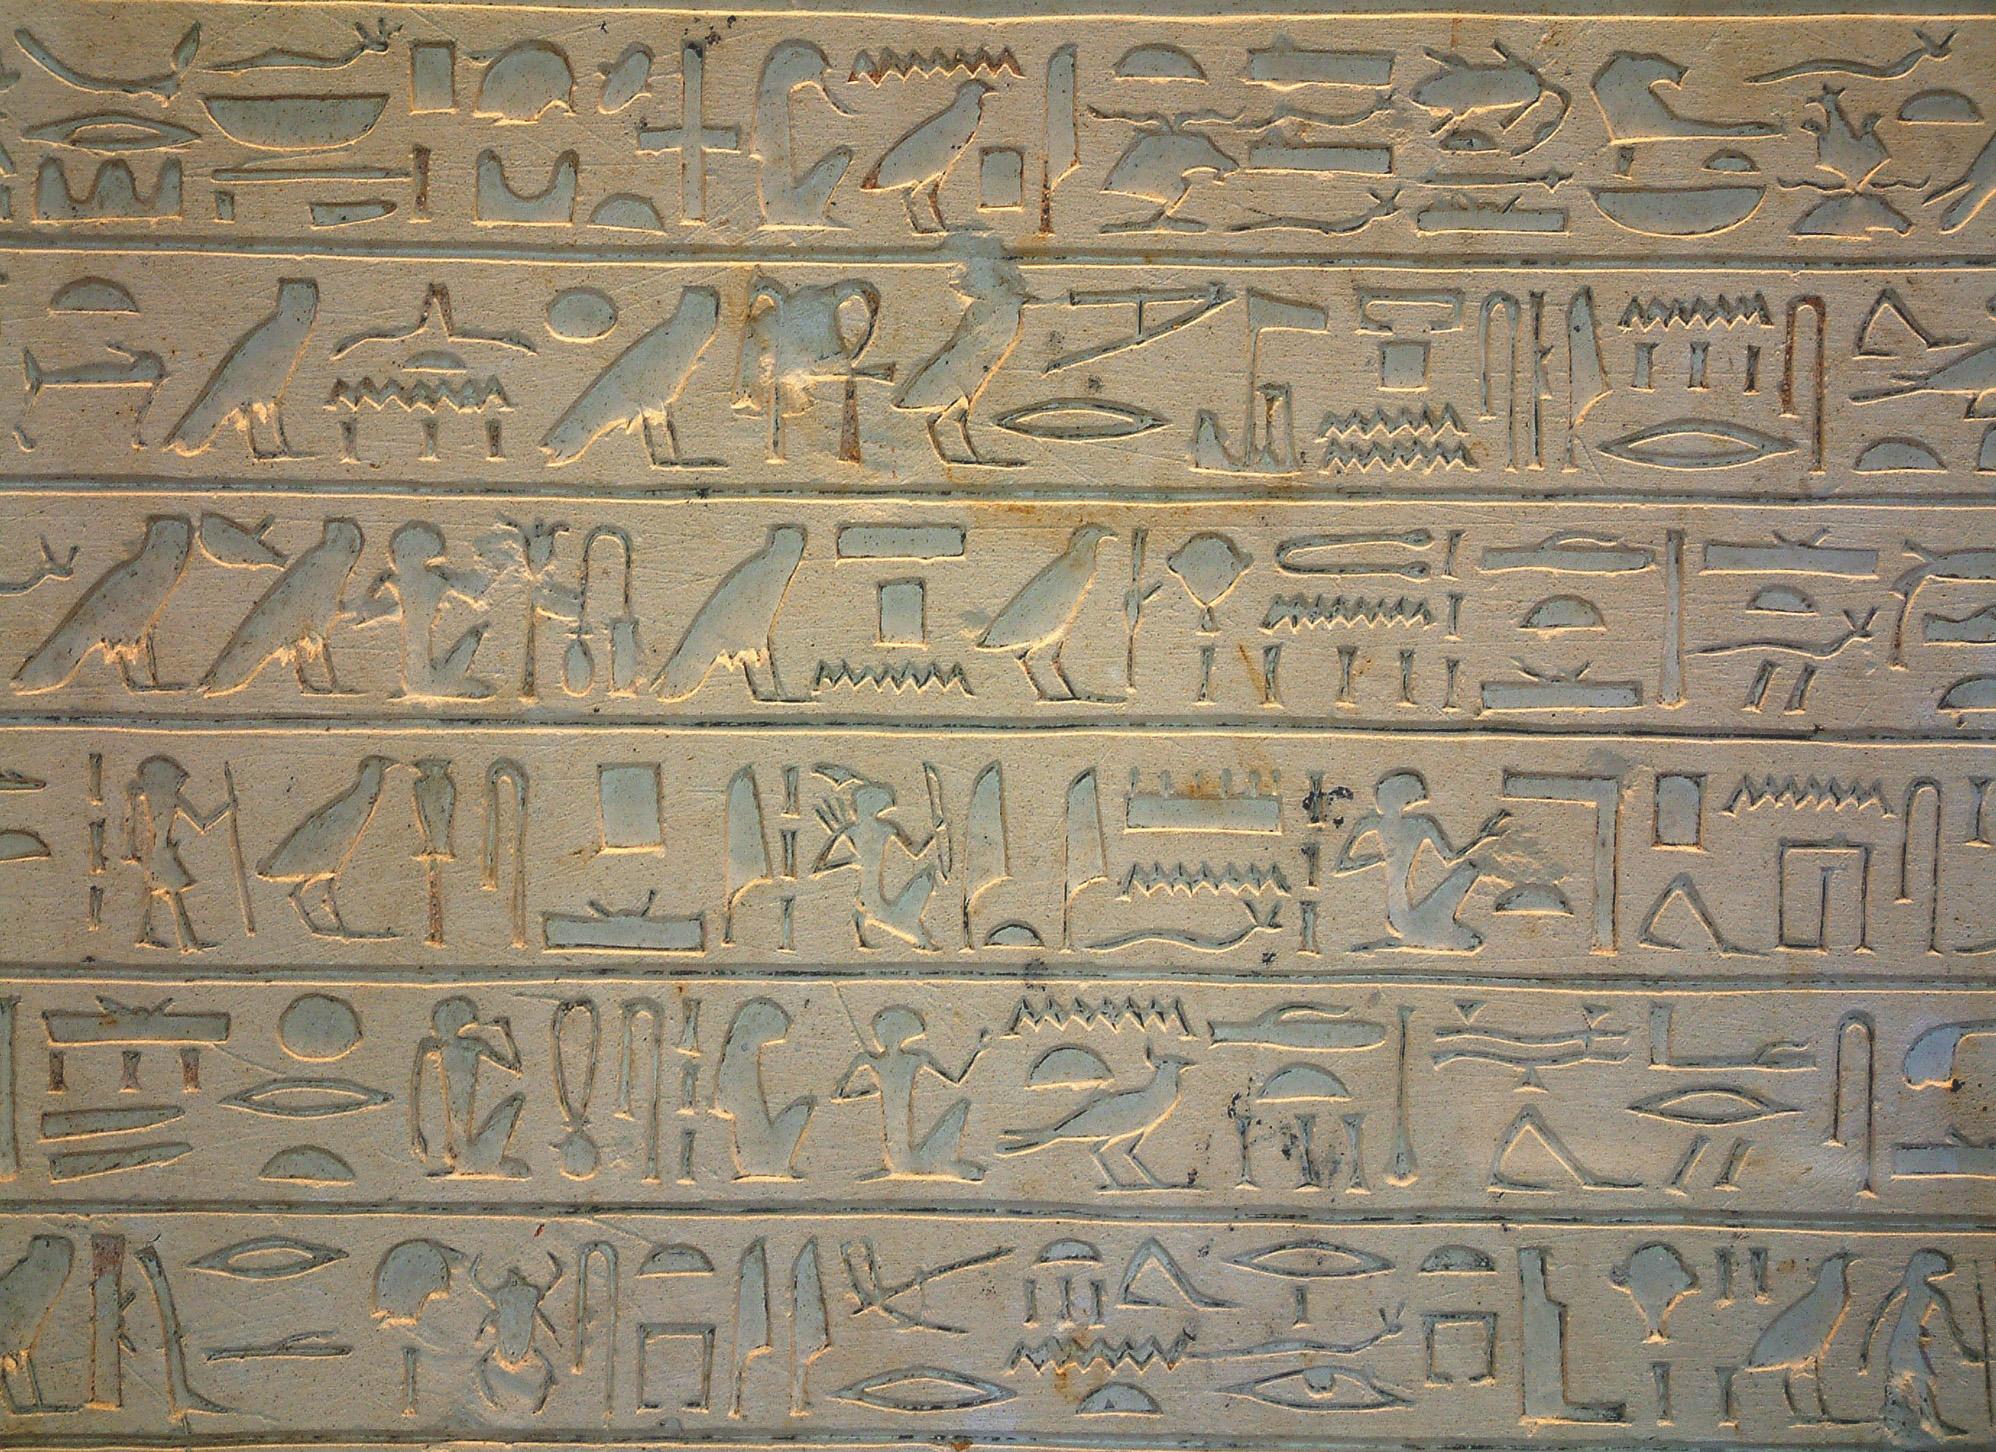 egypte_louvre_225_hieroglyphes.jpg